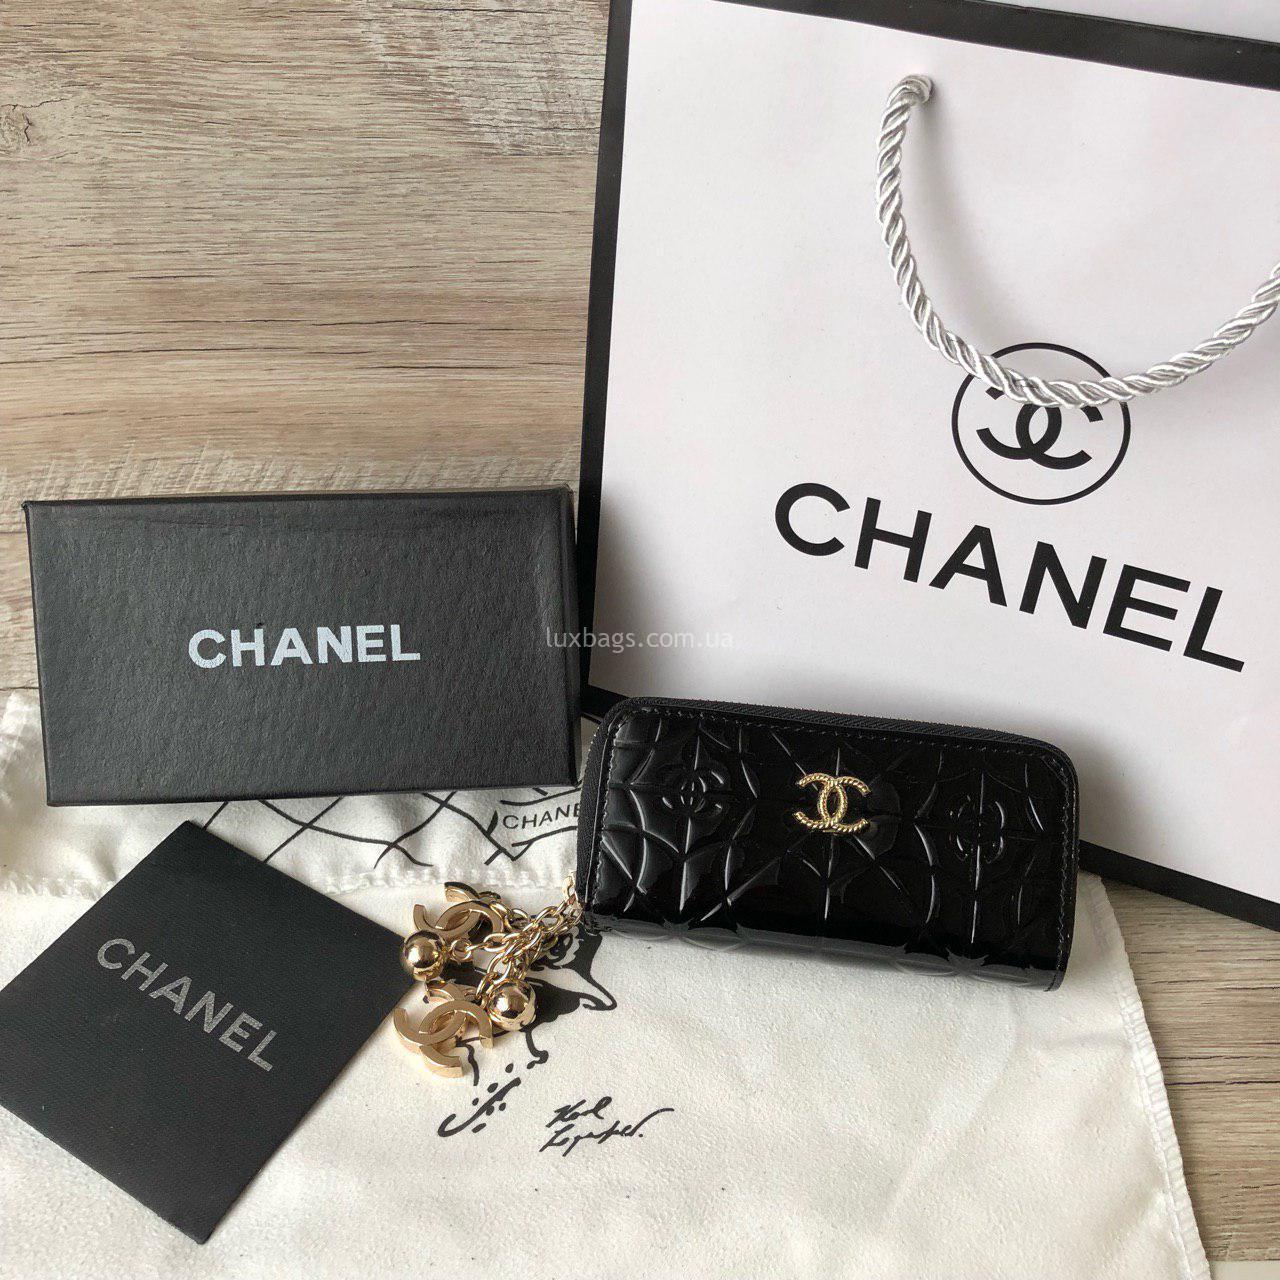 ffac097e9397 Карманная кожаная ключница Chanel Купить на lux-bags Недорого